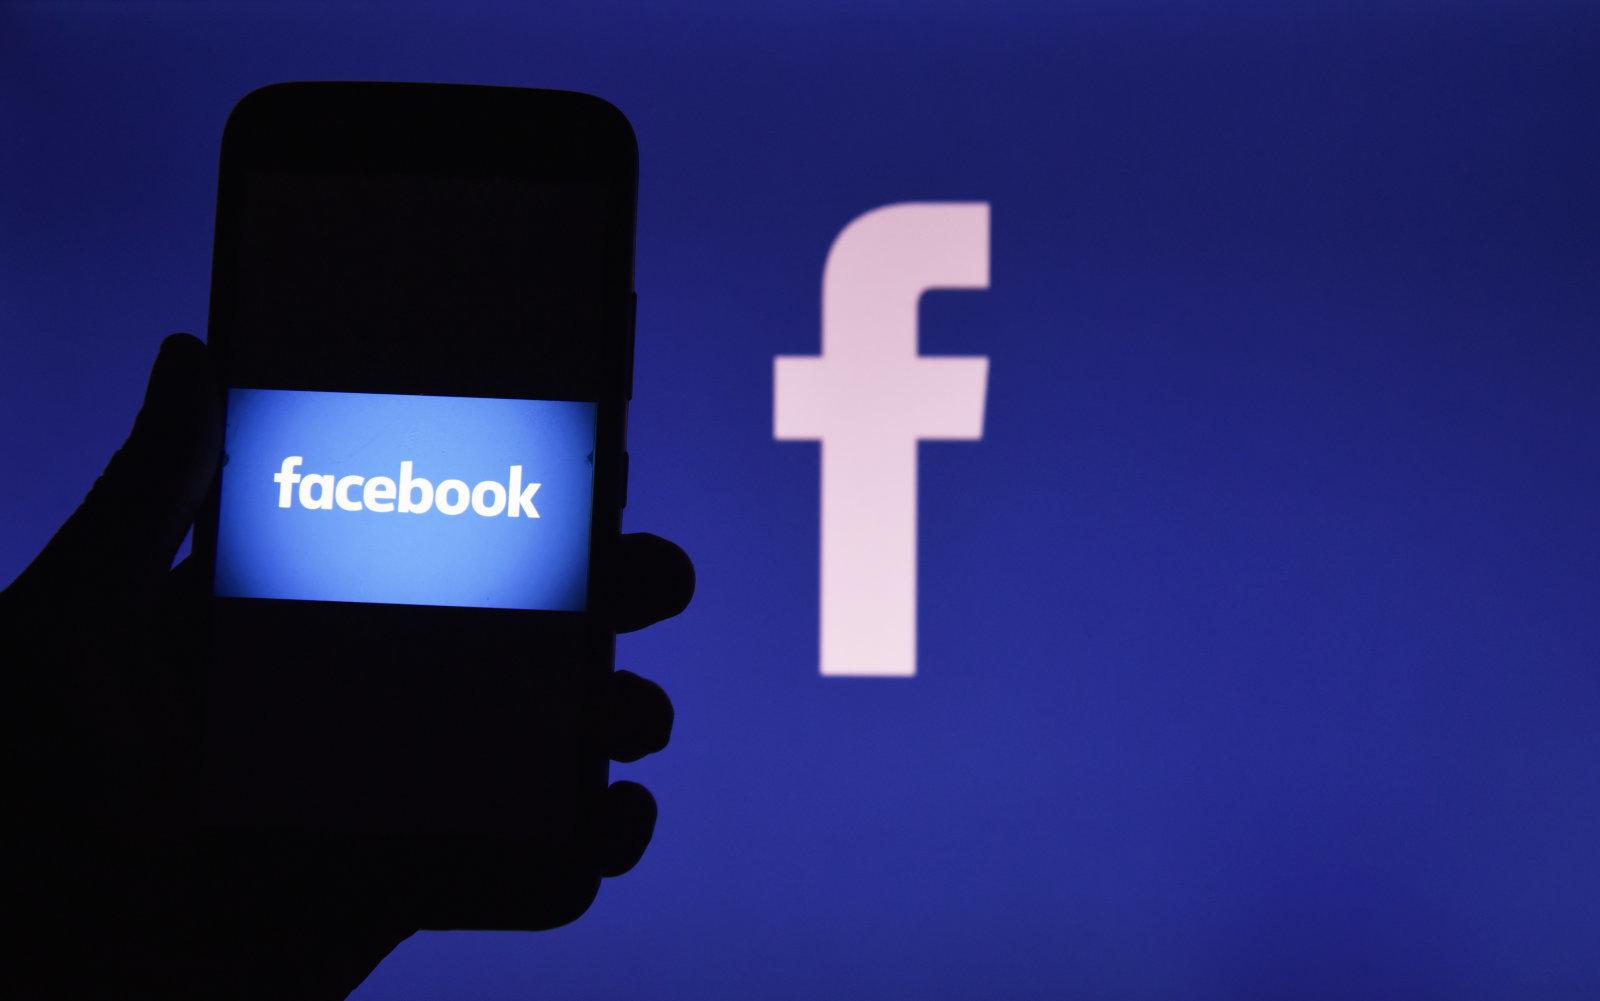 Facebook reveals the AI tool it used to ban 6.6 billion fake accountsFacebook披露了其用于禁止66亿个虚假账户的人工智能工具